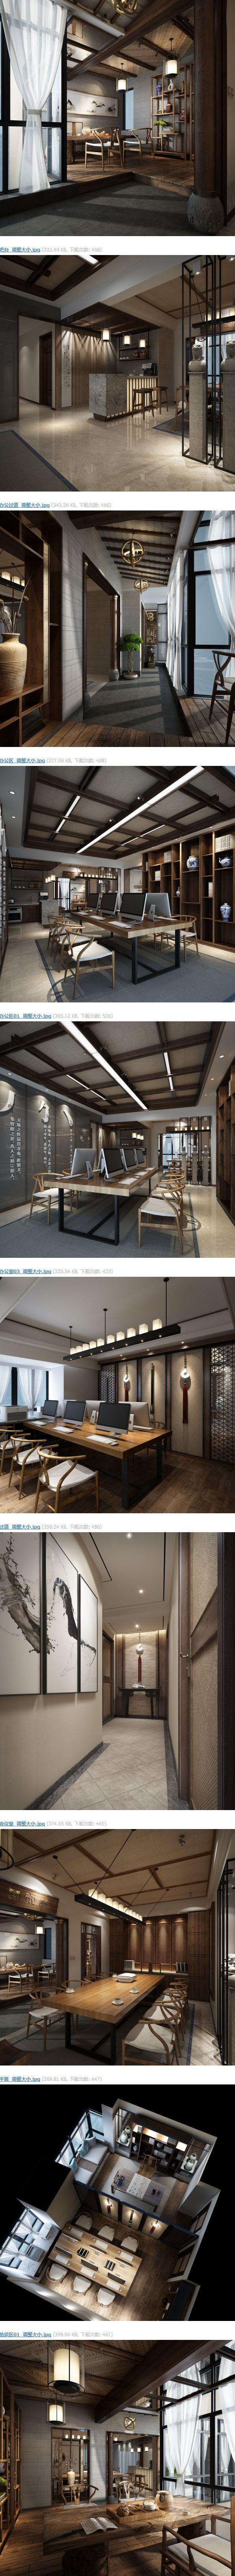 1787 best bars \u0026 restaurants images on Pinterest | Commercial ...